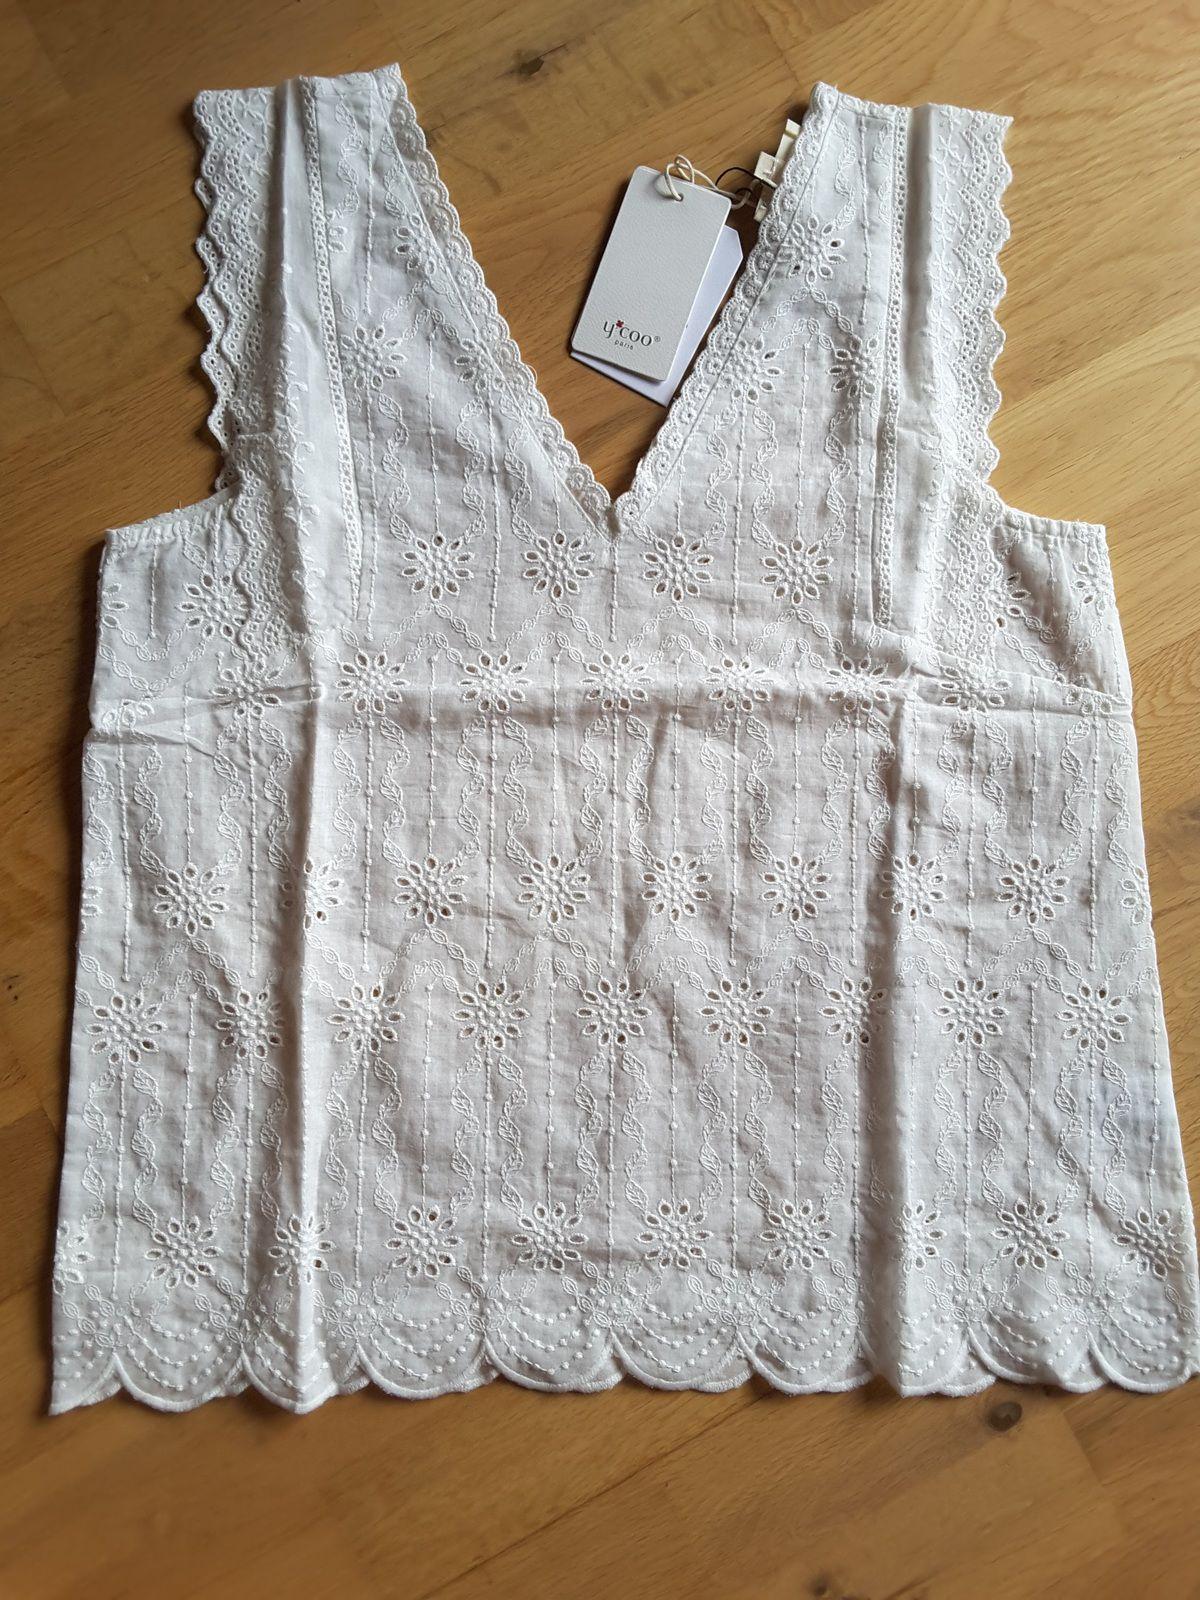 Creta Top summer ecru - Ycoo lookiero missbonsplansdunet box vêtements styliste personal shopper